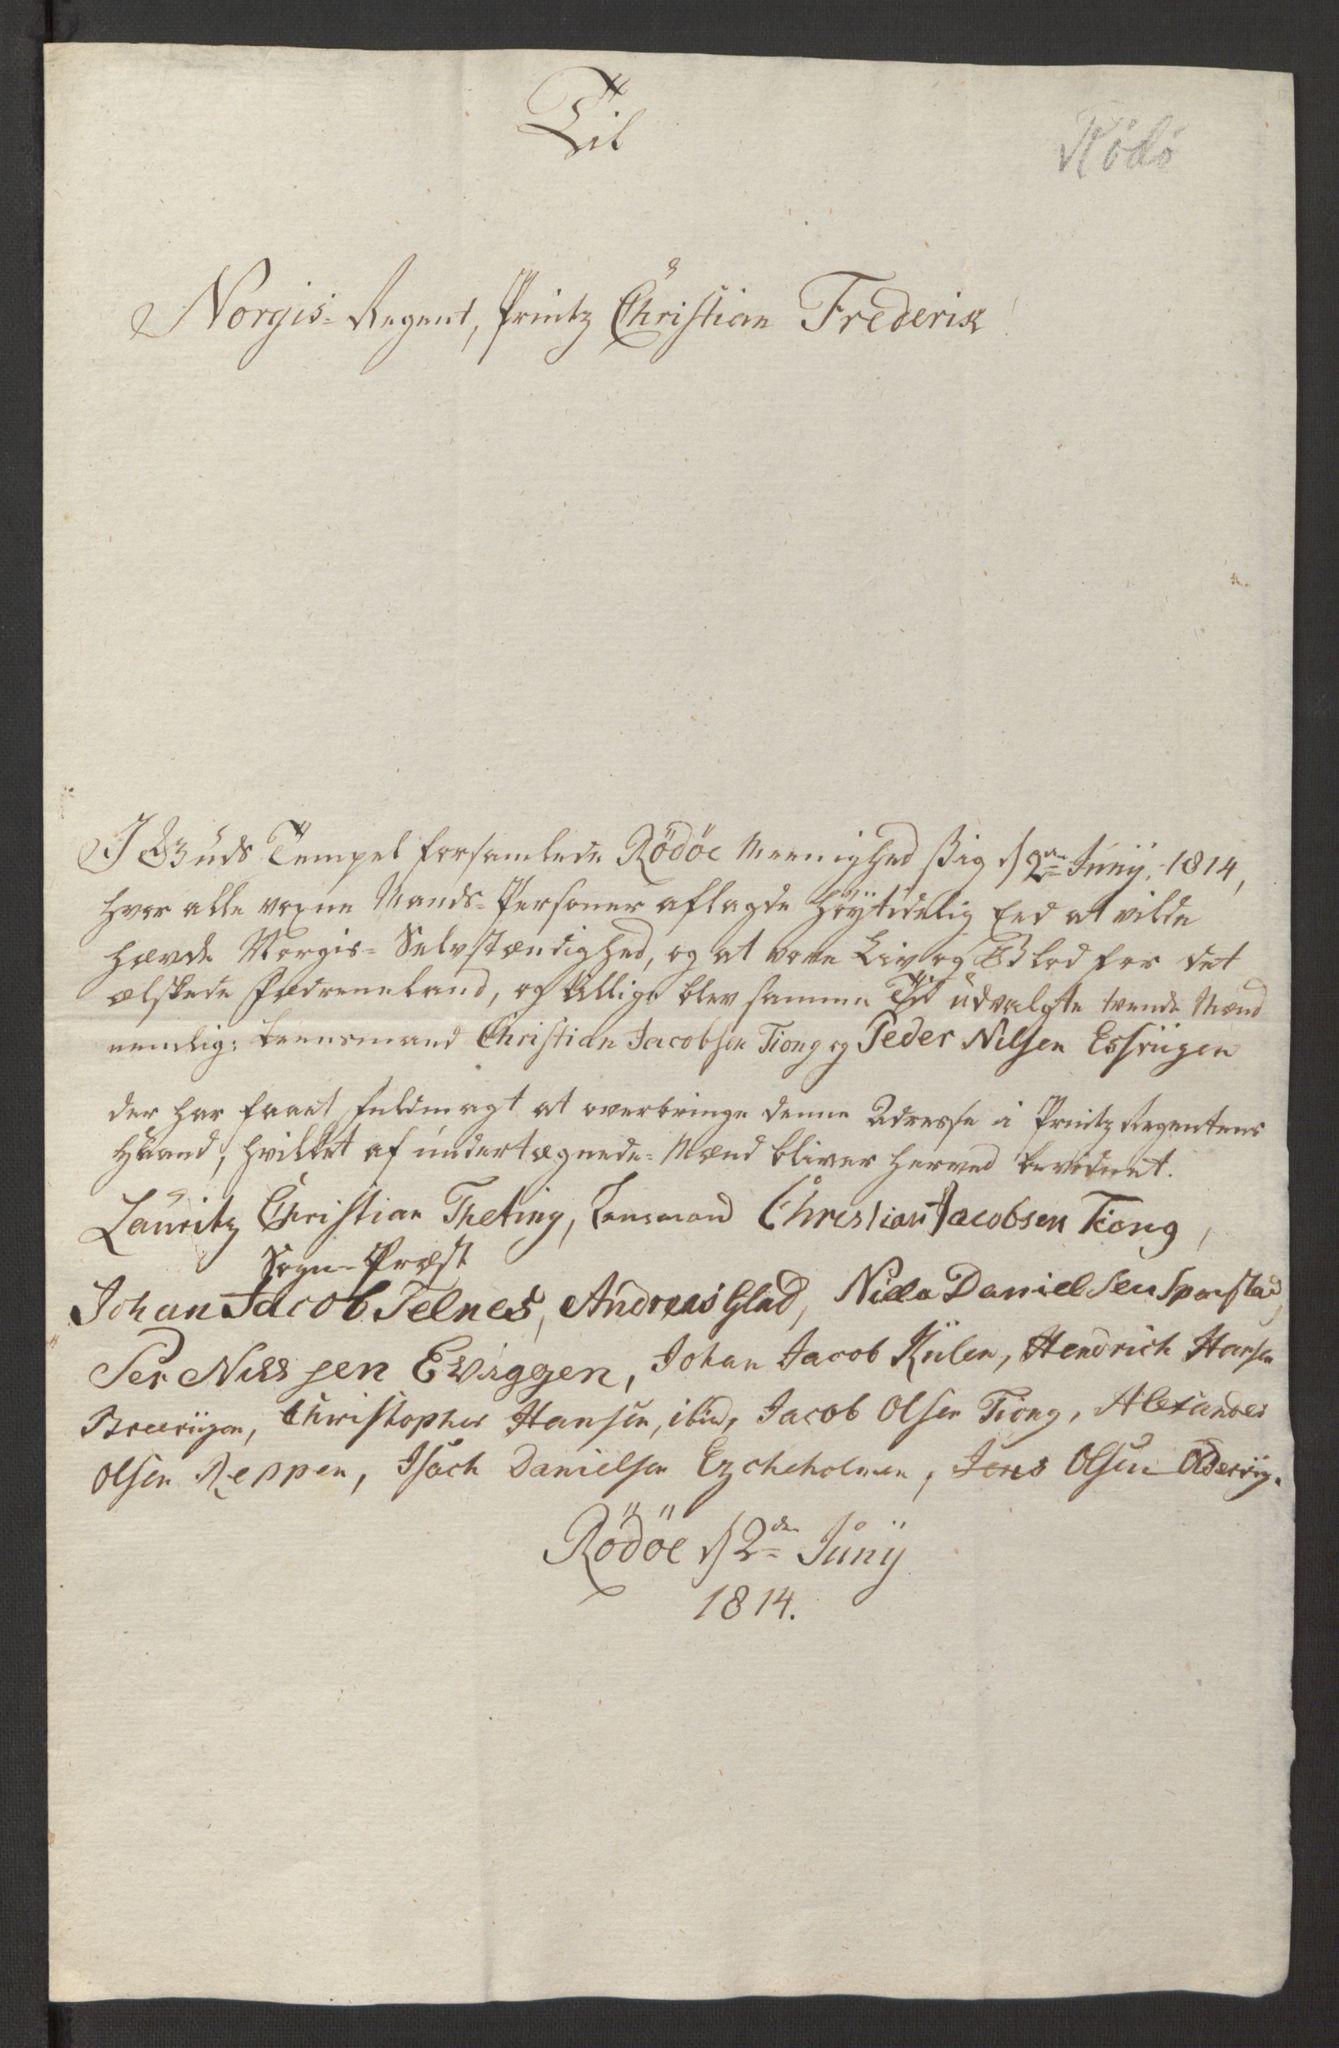 SAT, Nordland amt/fylke*, 1814, s. 39